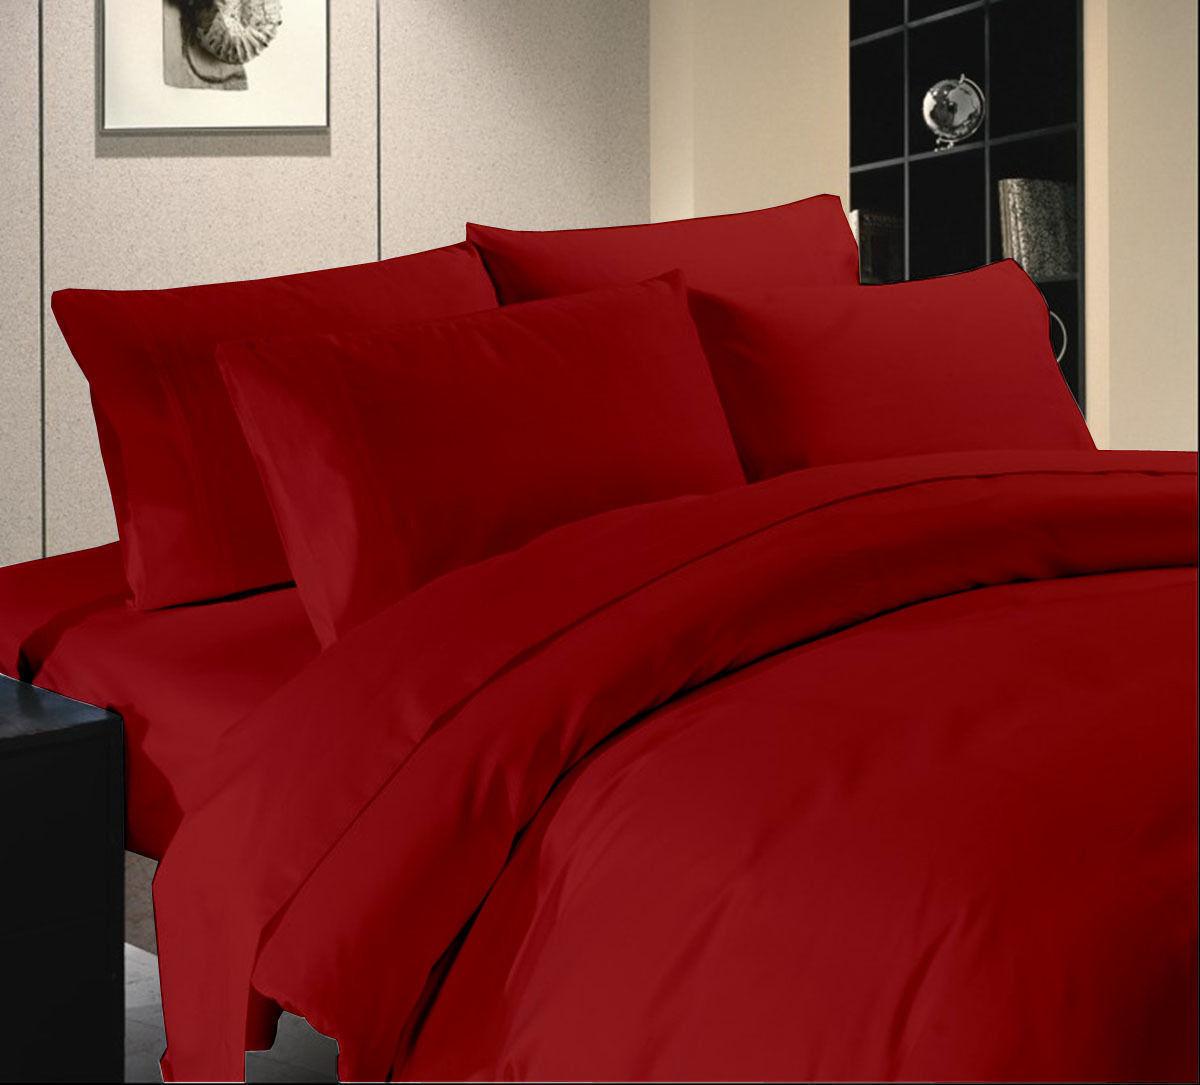 1000 TC nouveau Egyptian Cotton rouge Solid AU Queen Taille All Bedding Item